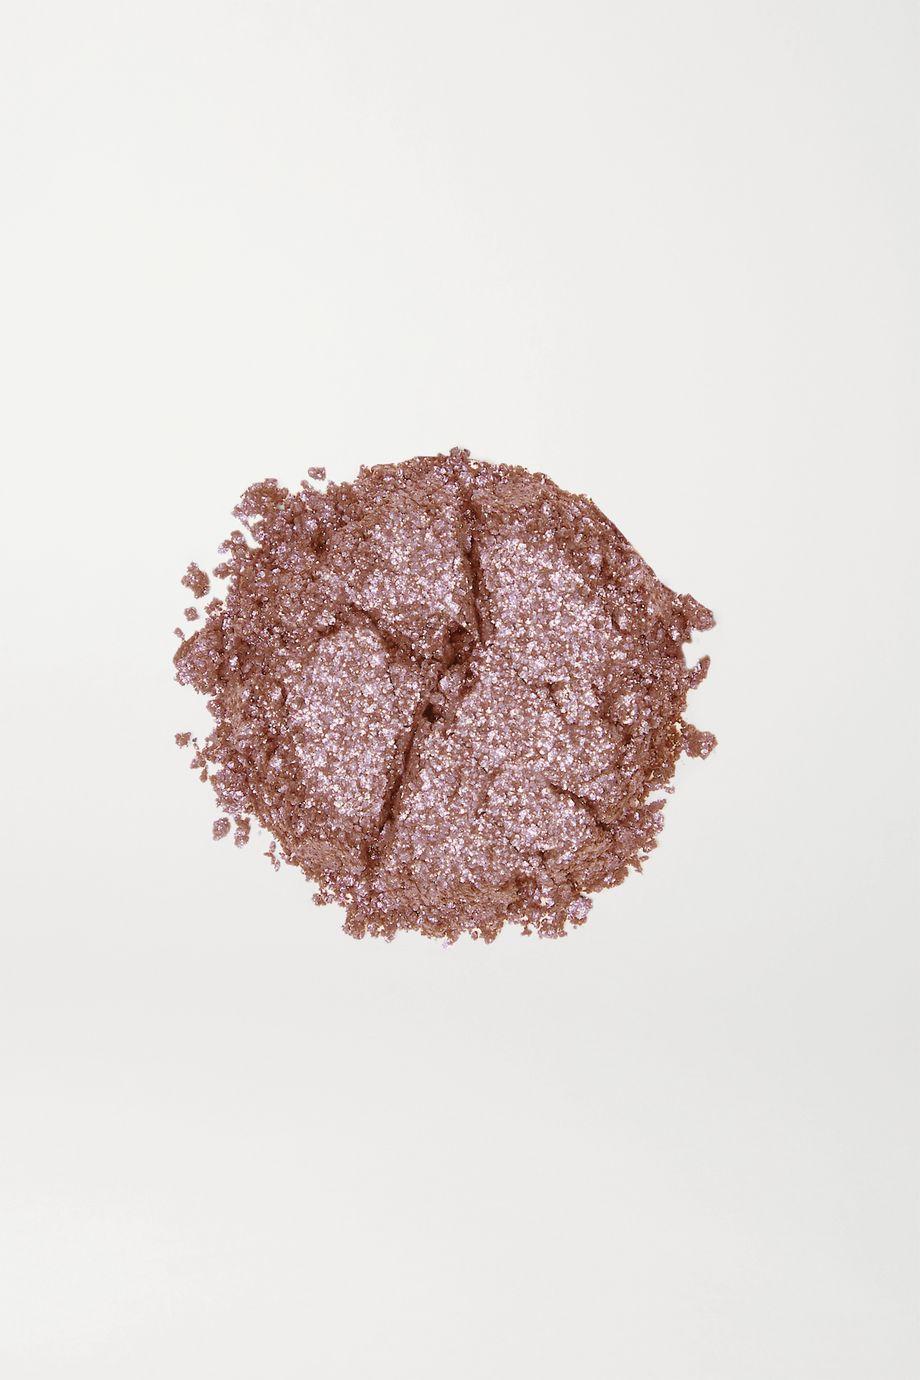 Victoria Beckham Beauty Lid Lustre - Tea Rose